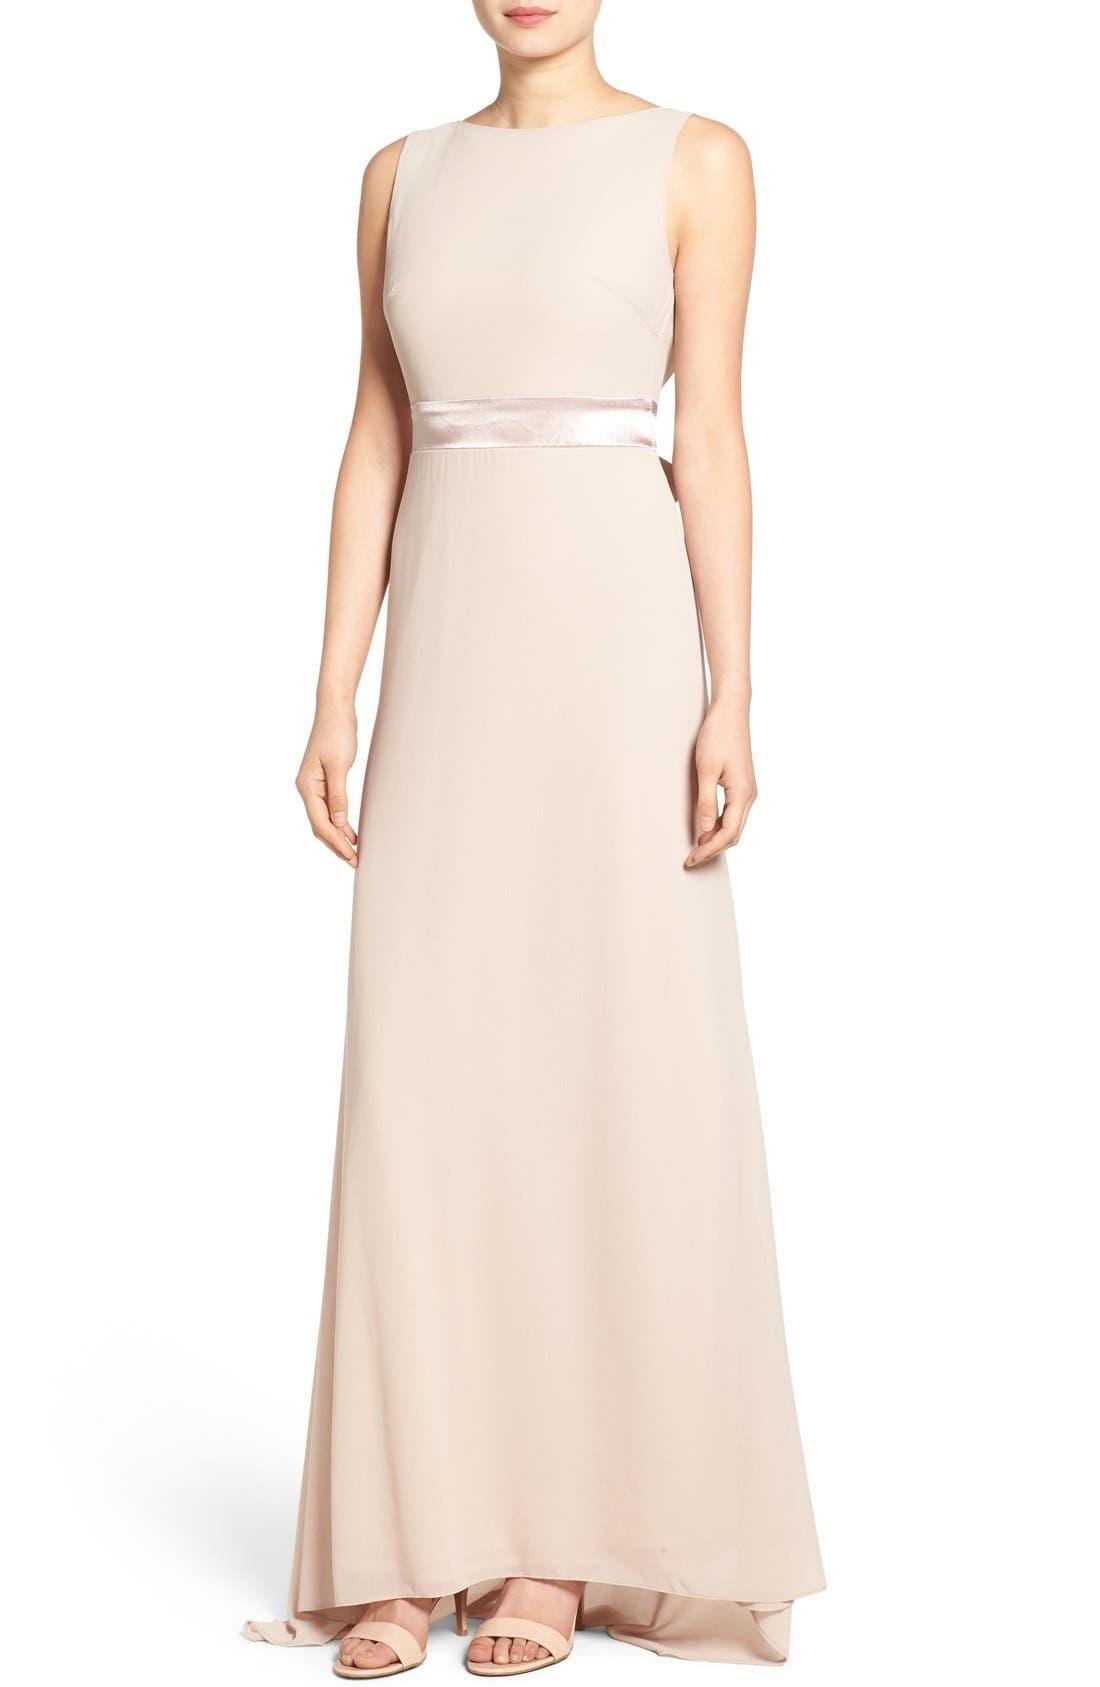 Alternate Image 1 Selected - TFNC 'Halanna' Bow Detail Maxi Dress